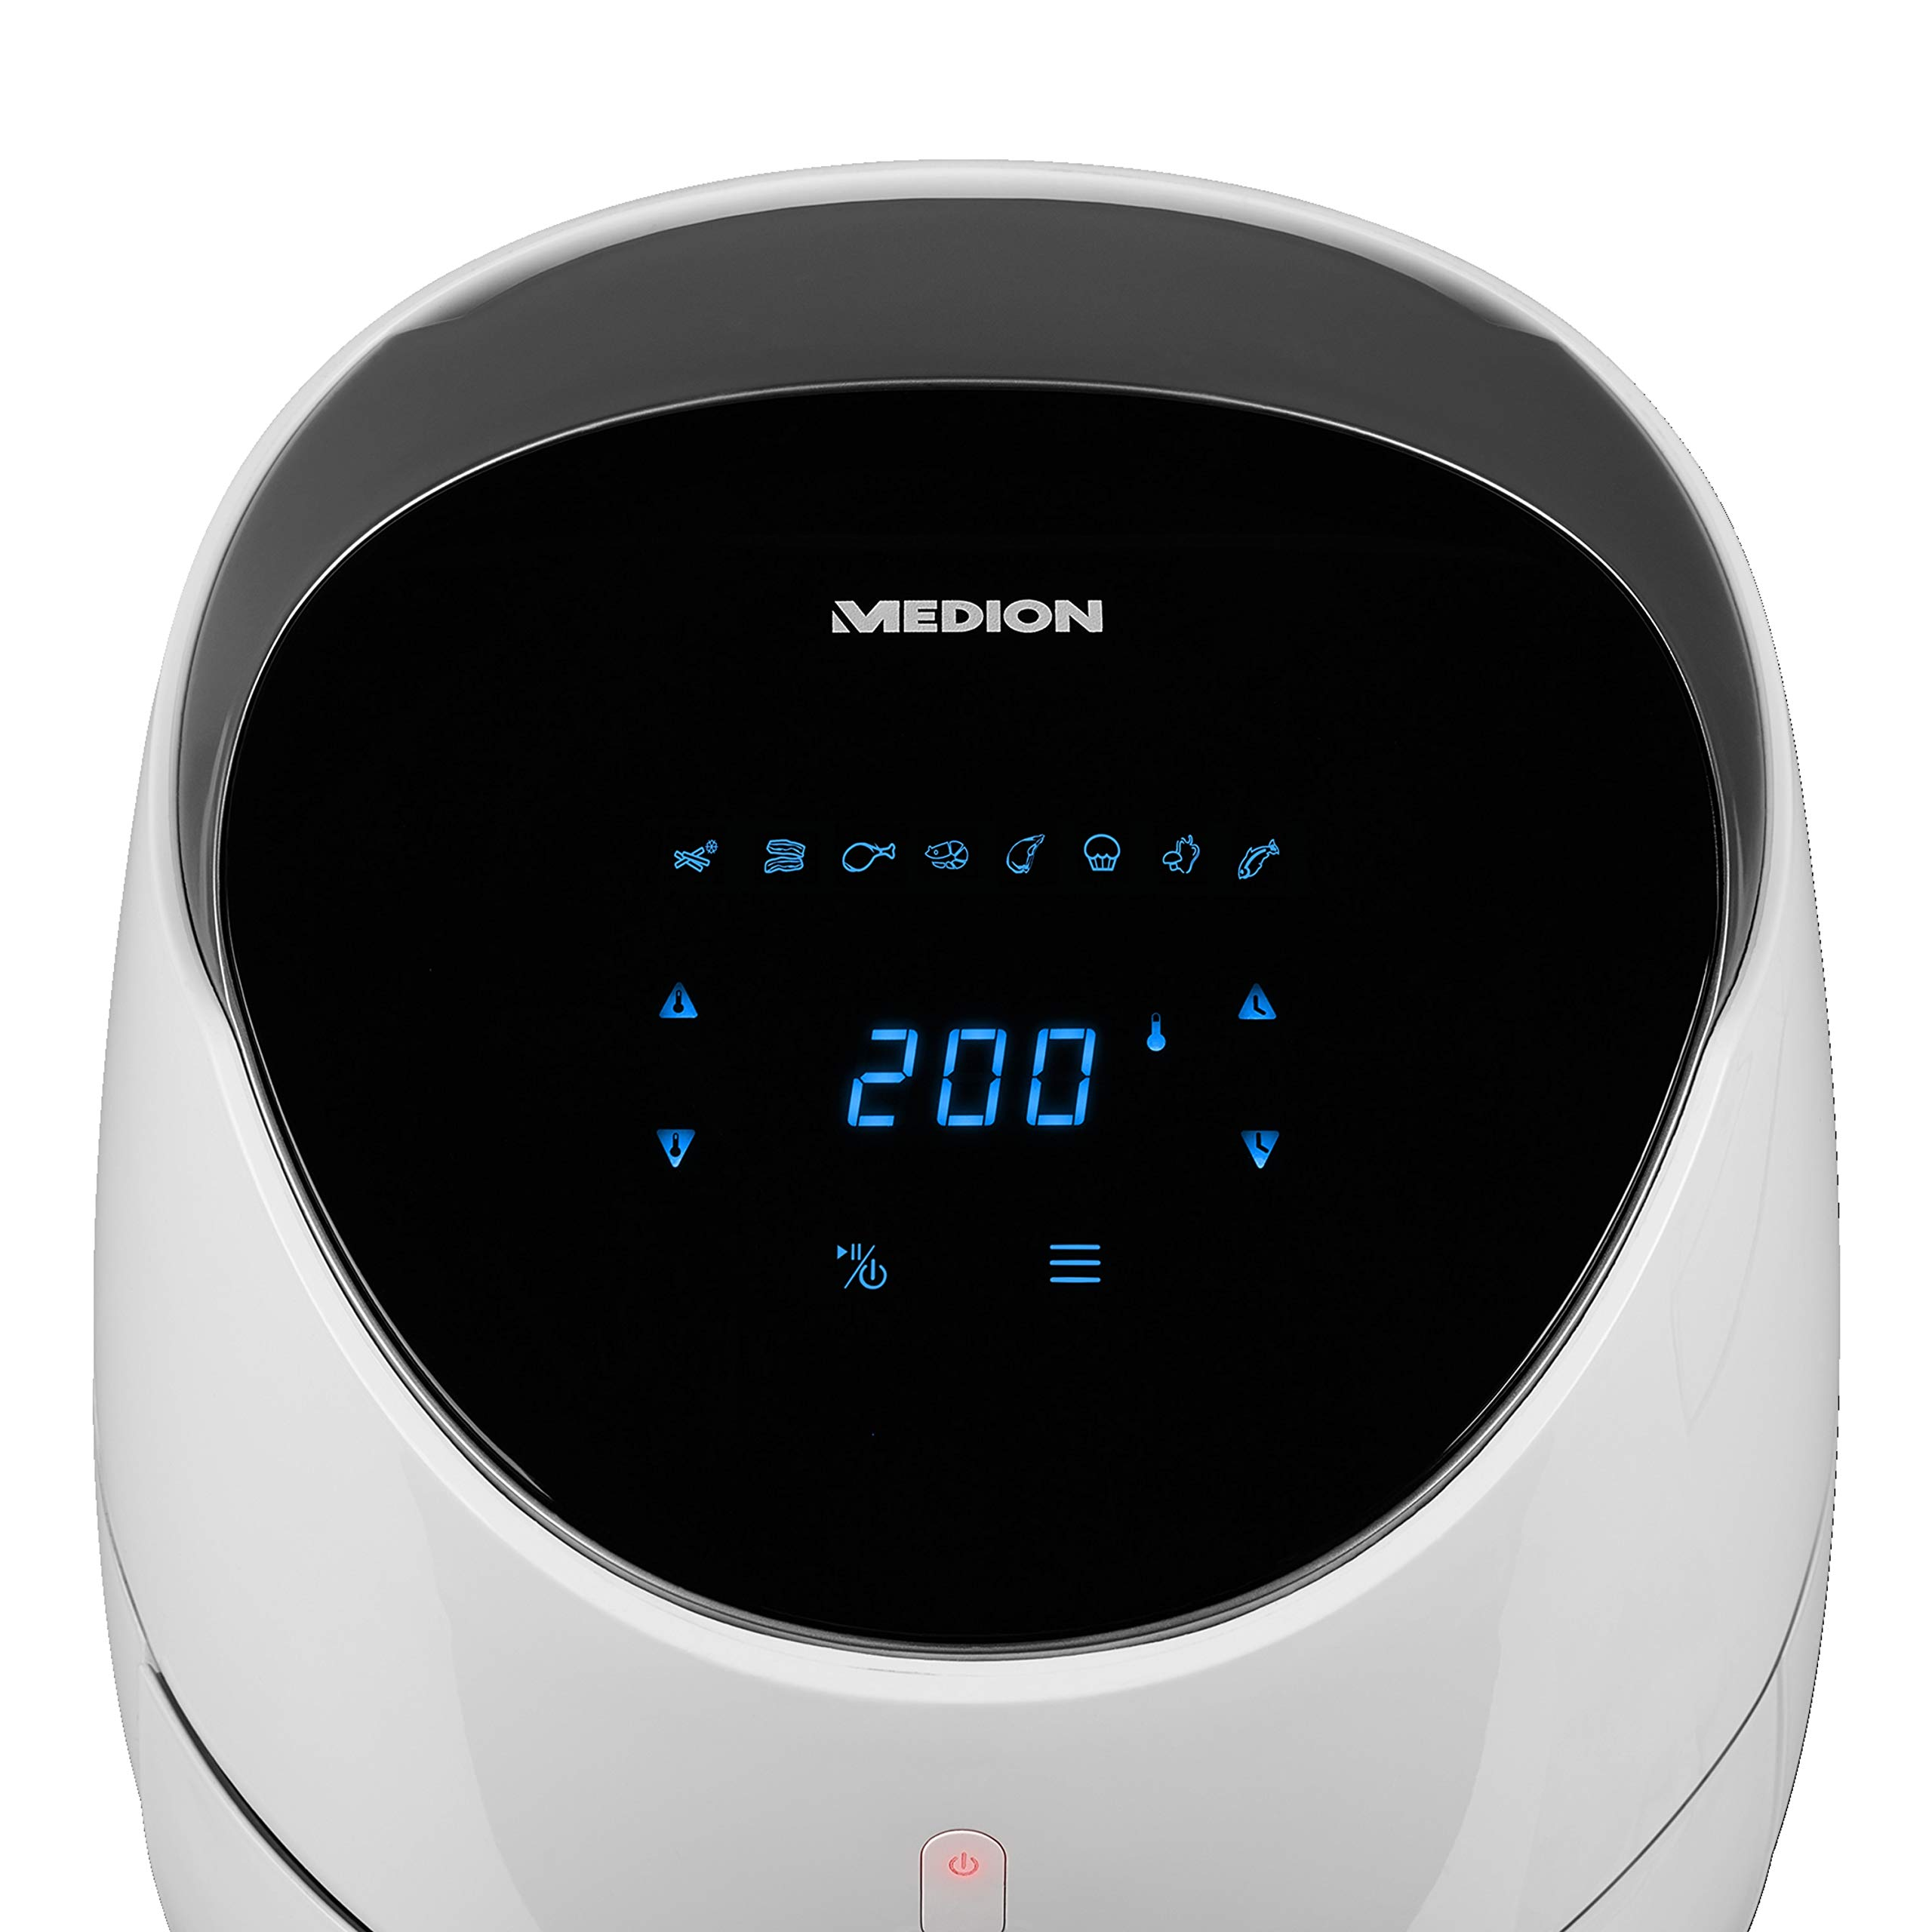 MEDION MD 18290 - Freidora (Freidora de aire caliente, 4,5 L, 1,8 ...